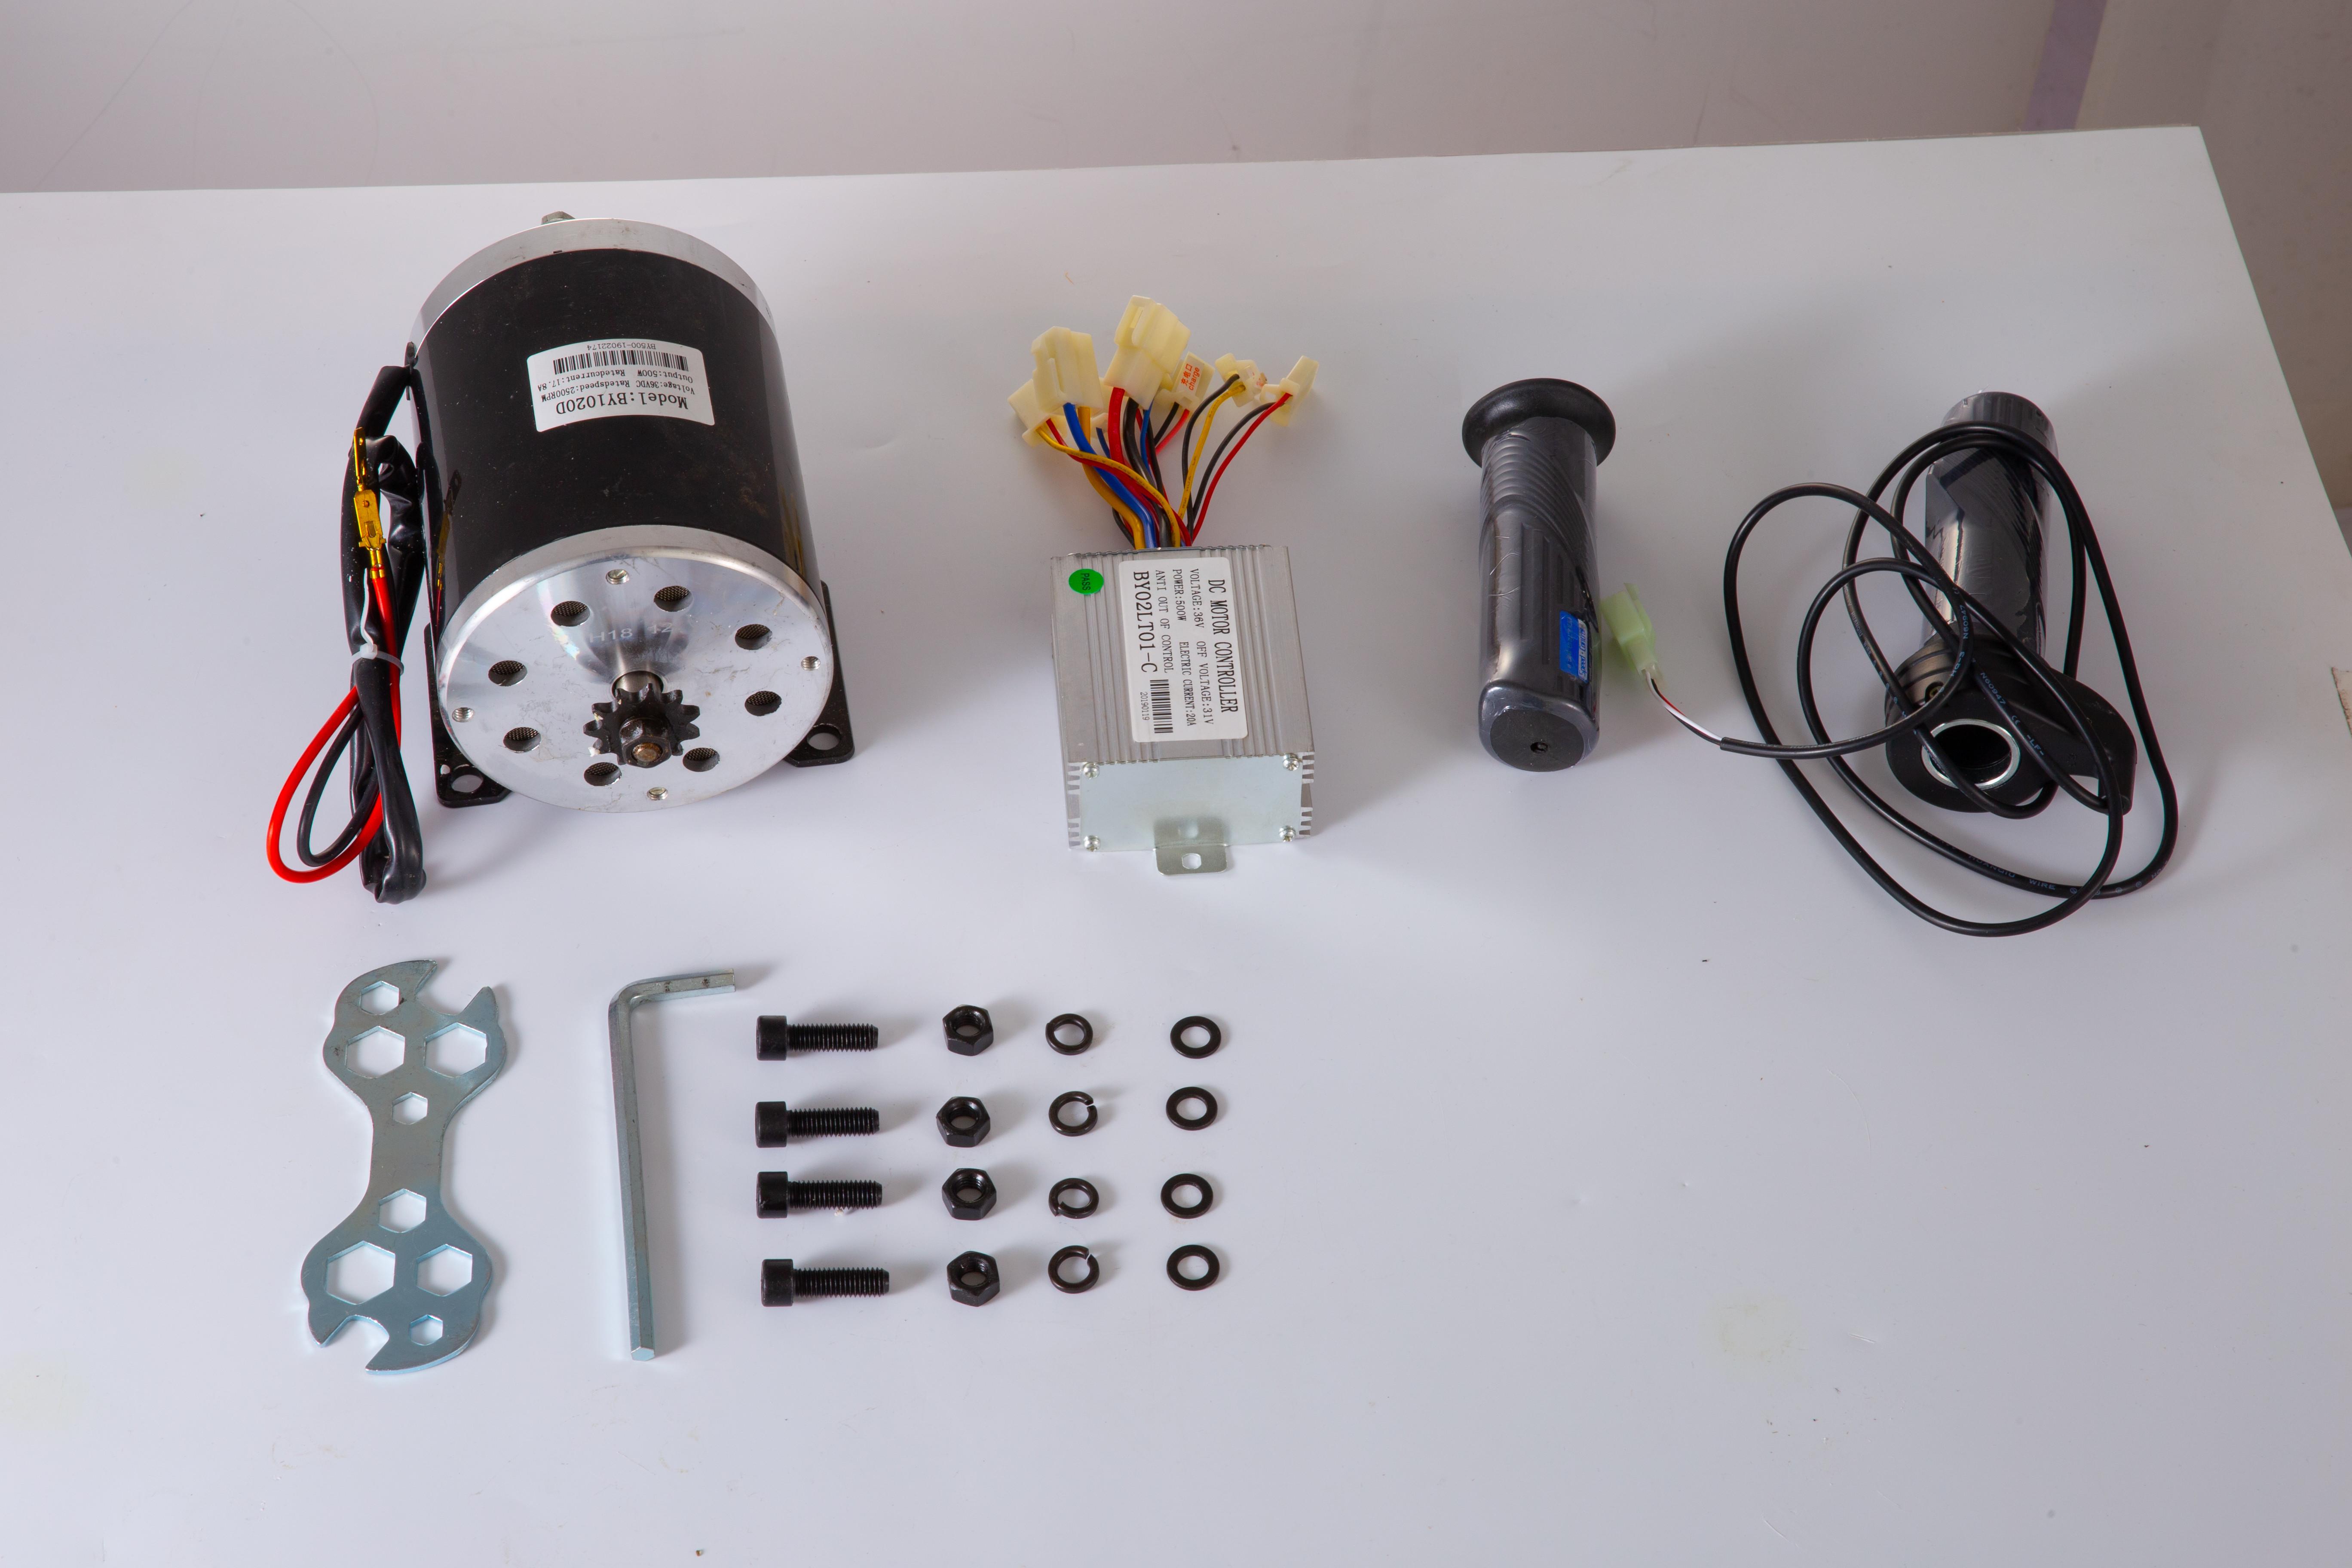 36v-Electric-Motor-controller-throttle-kit-f-Scooter-E-Scooter-ATV-Permanent thumbnail 48